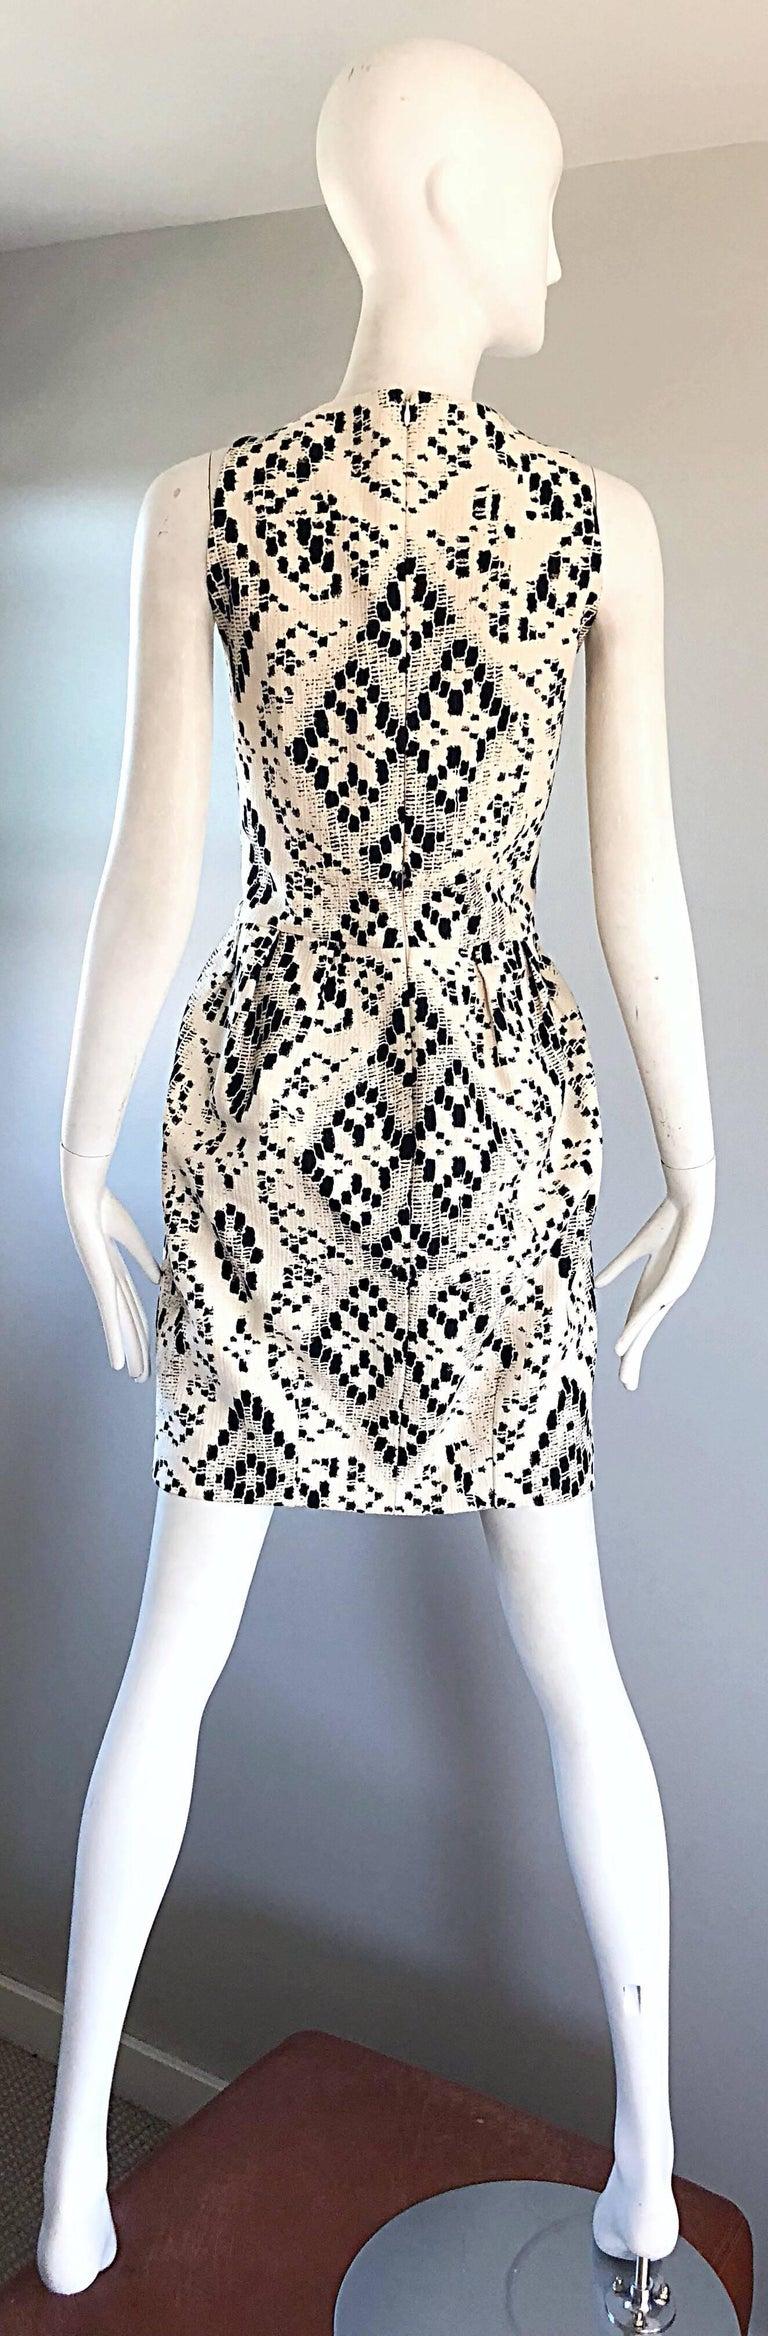 Giambattista Valli Size 10 / 12 Black and White Abstract Sleeveless Dress For Sale 1